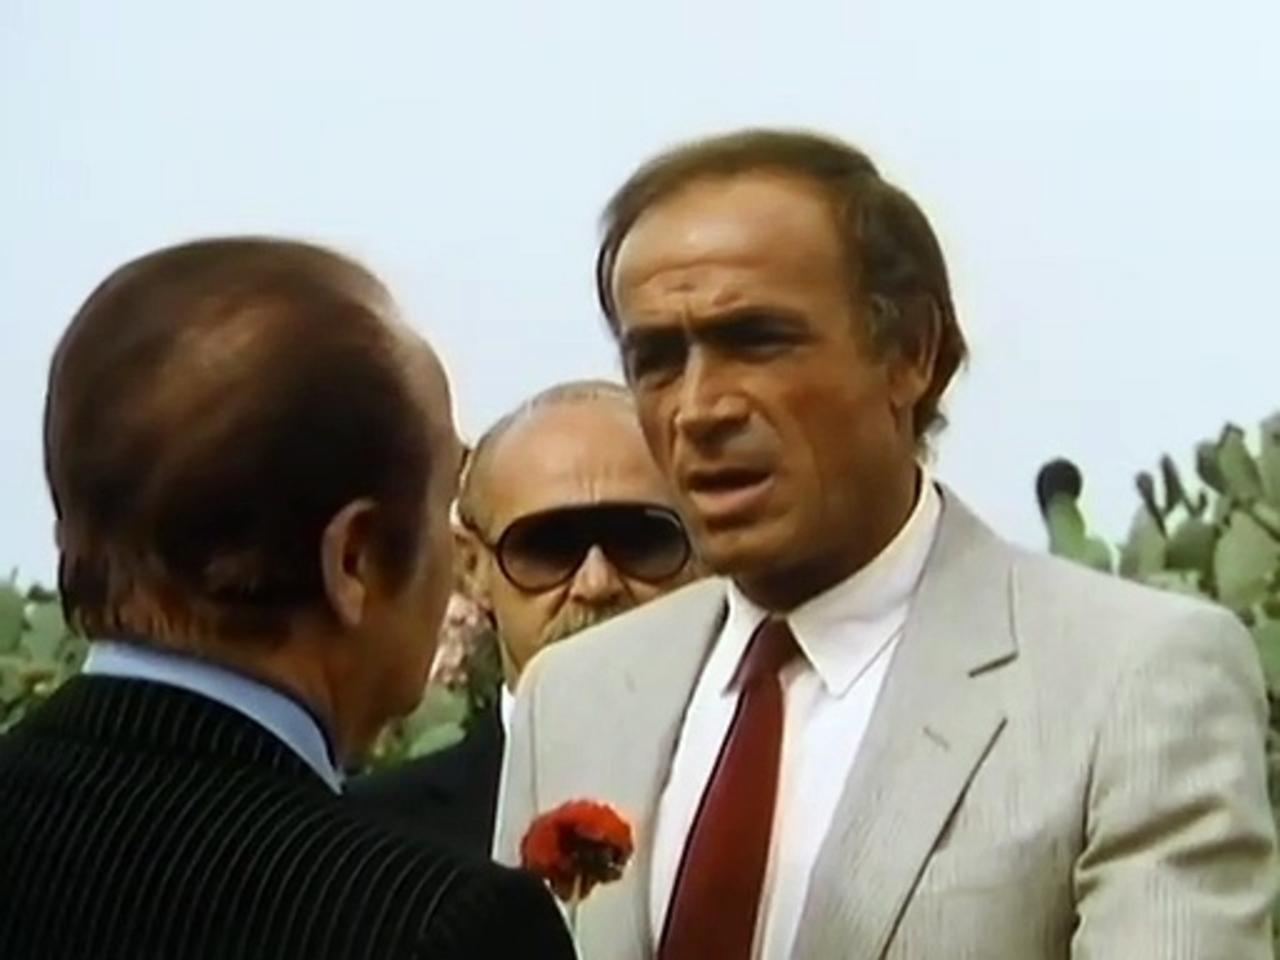 FINAL JUSTICE Movie (1984) - Joe Don Baker